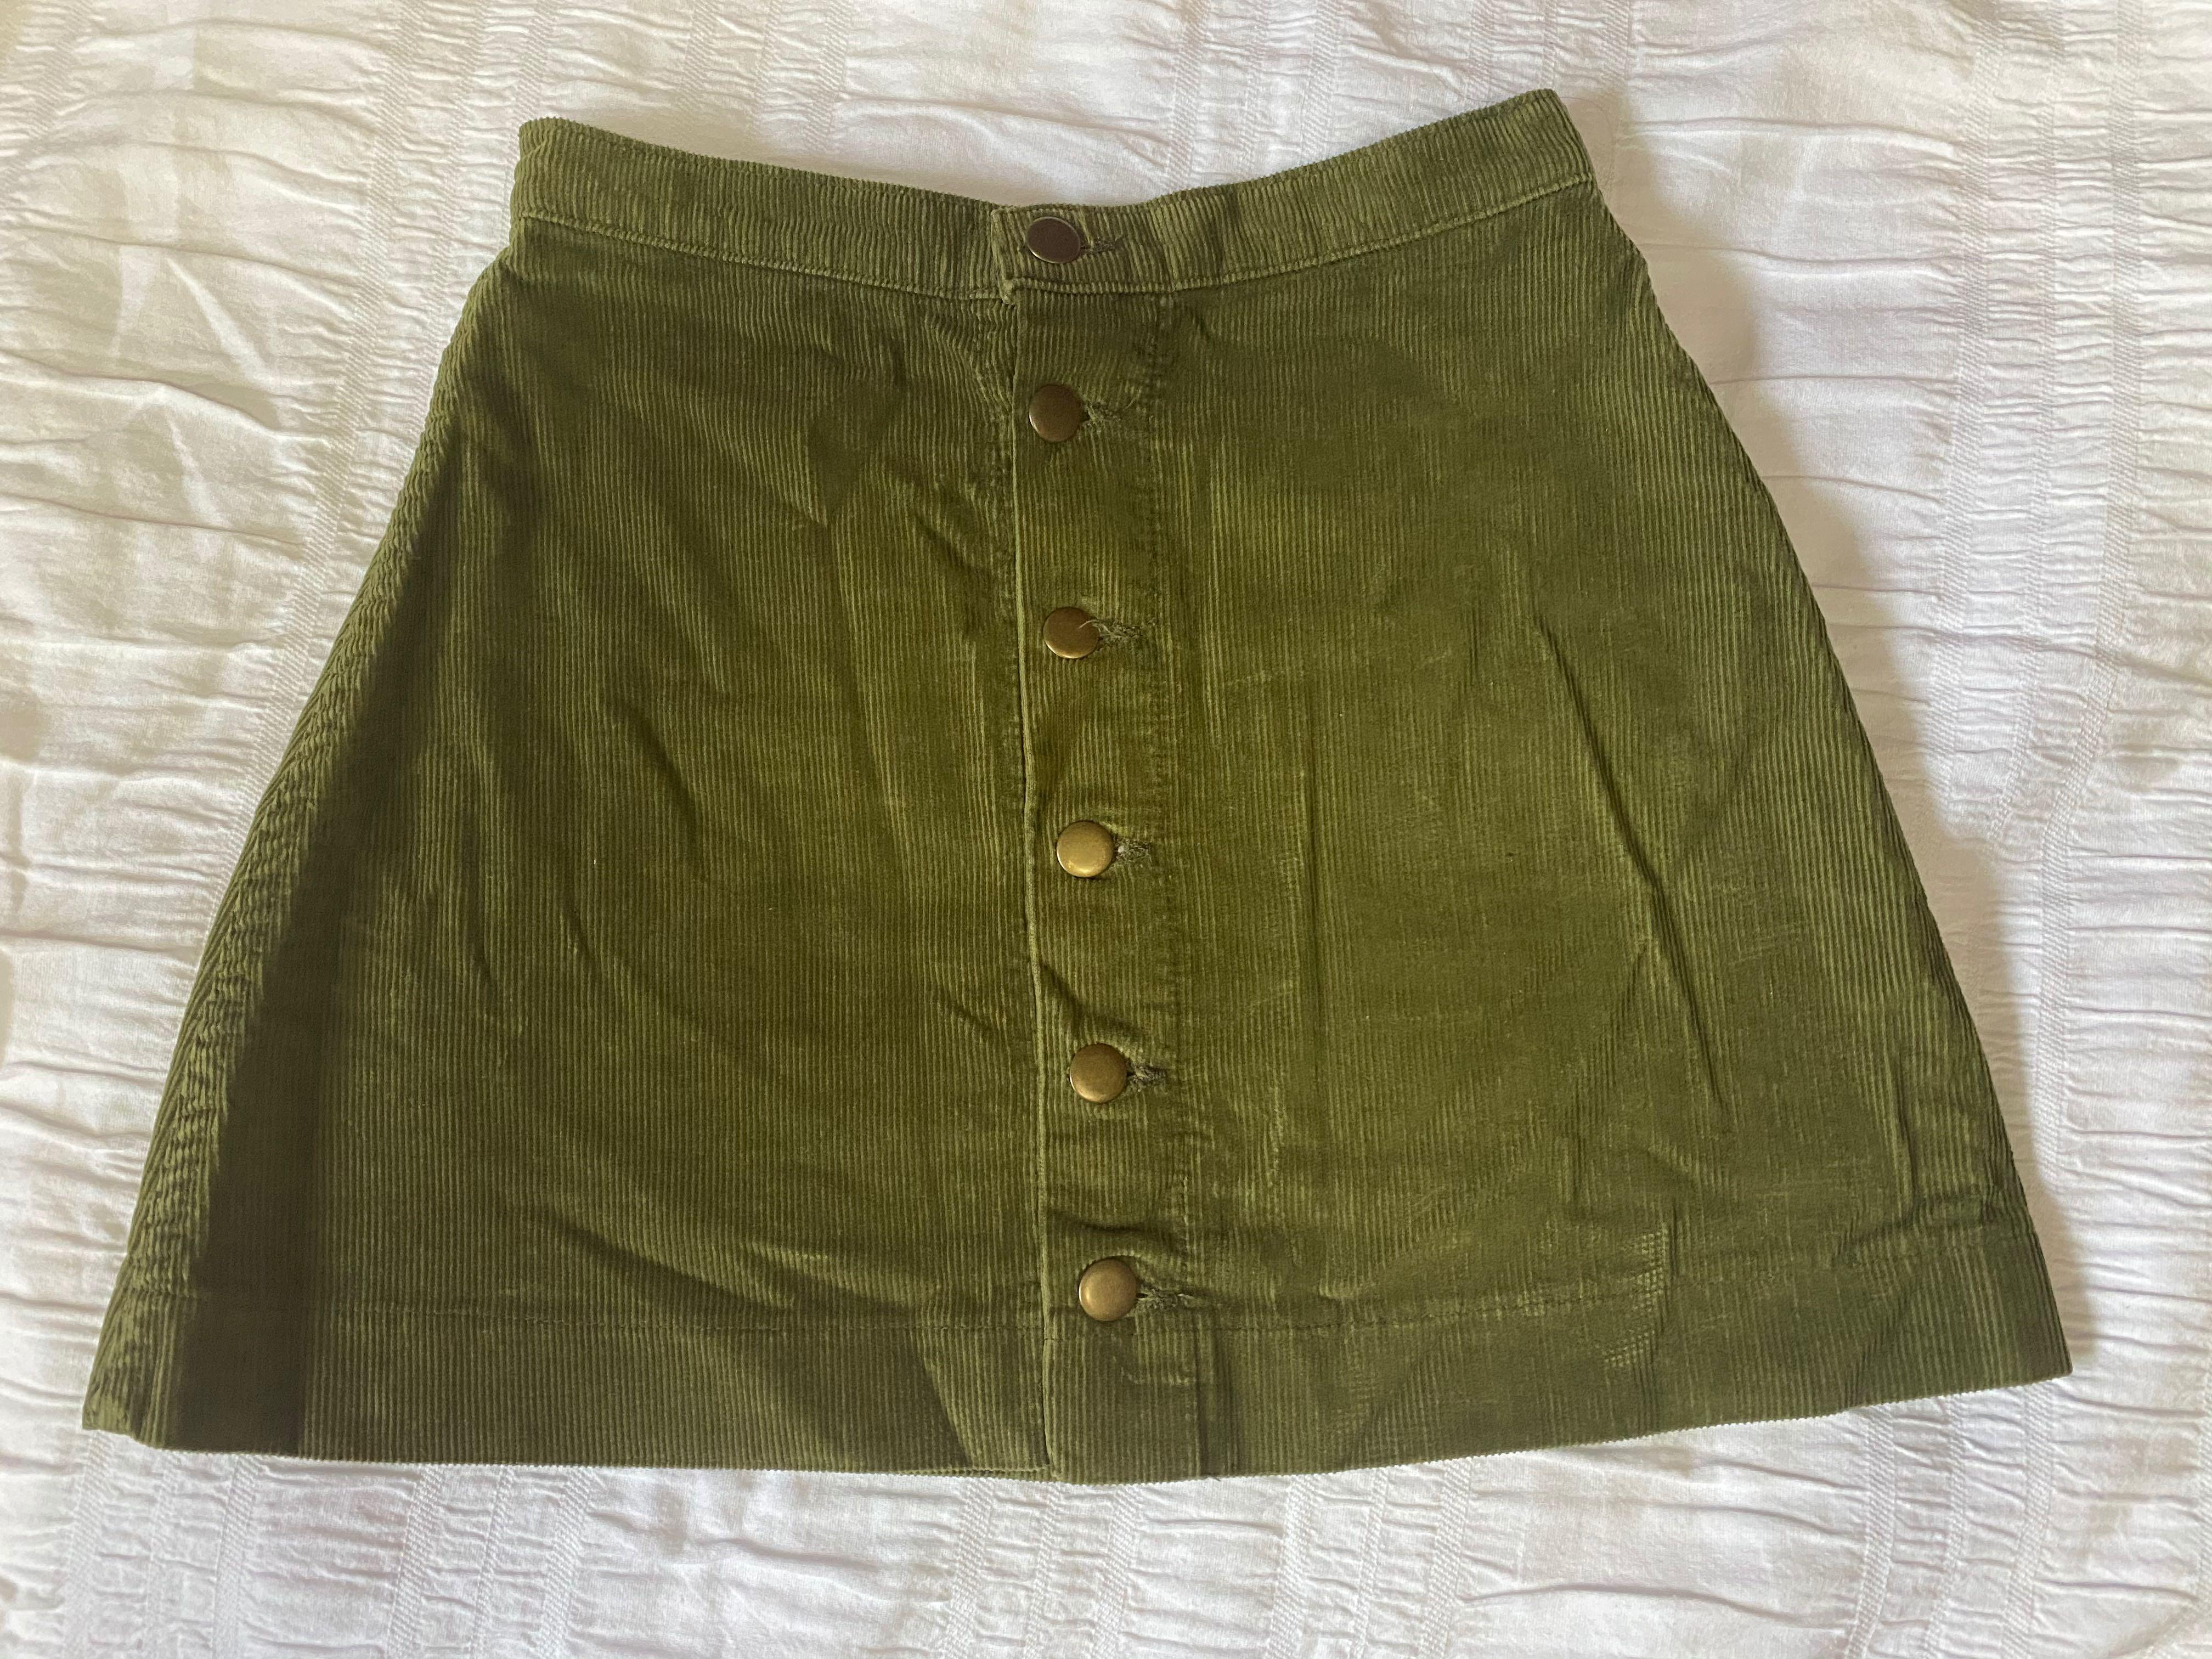 American Apparel Corduroy Skirt